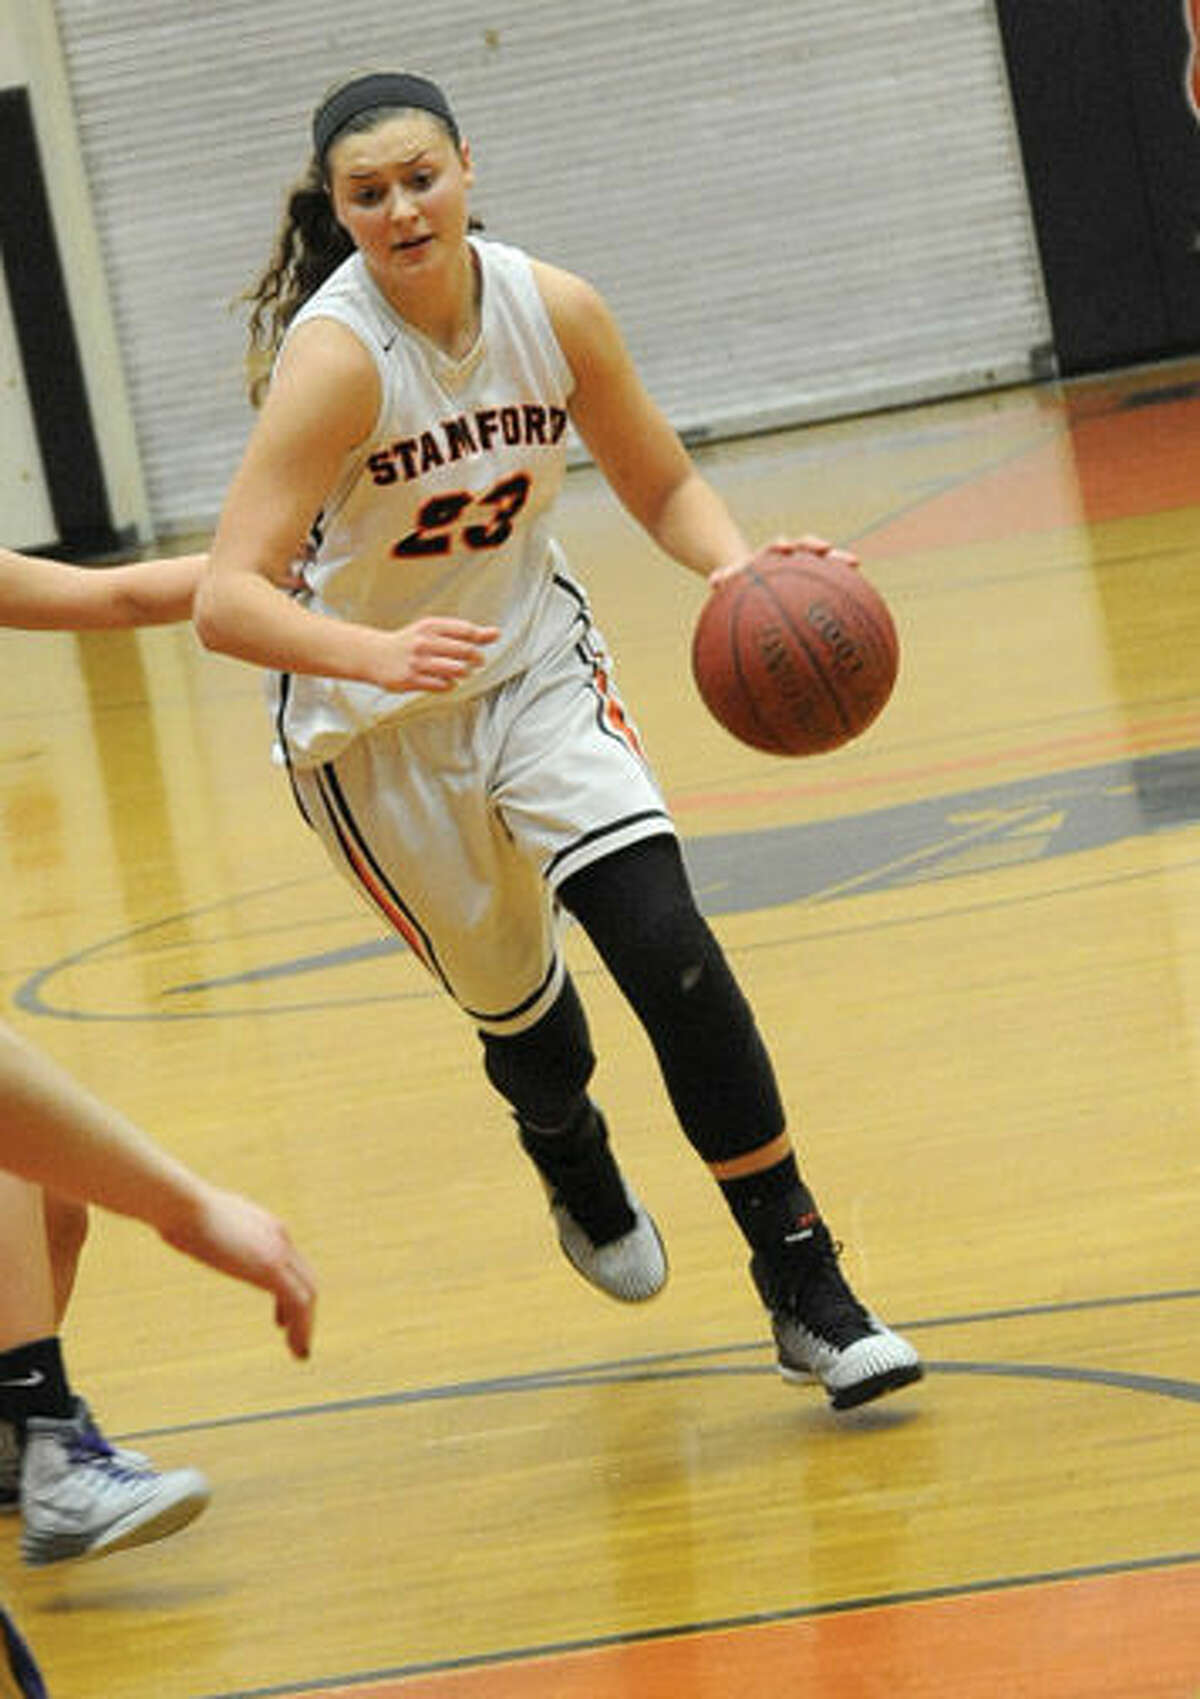 #23 Stamford girls basketball Alexa Kellner.